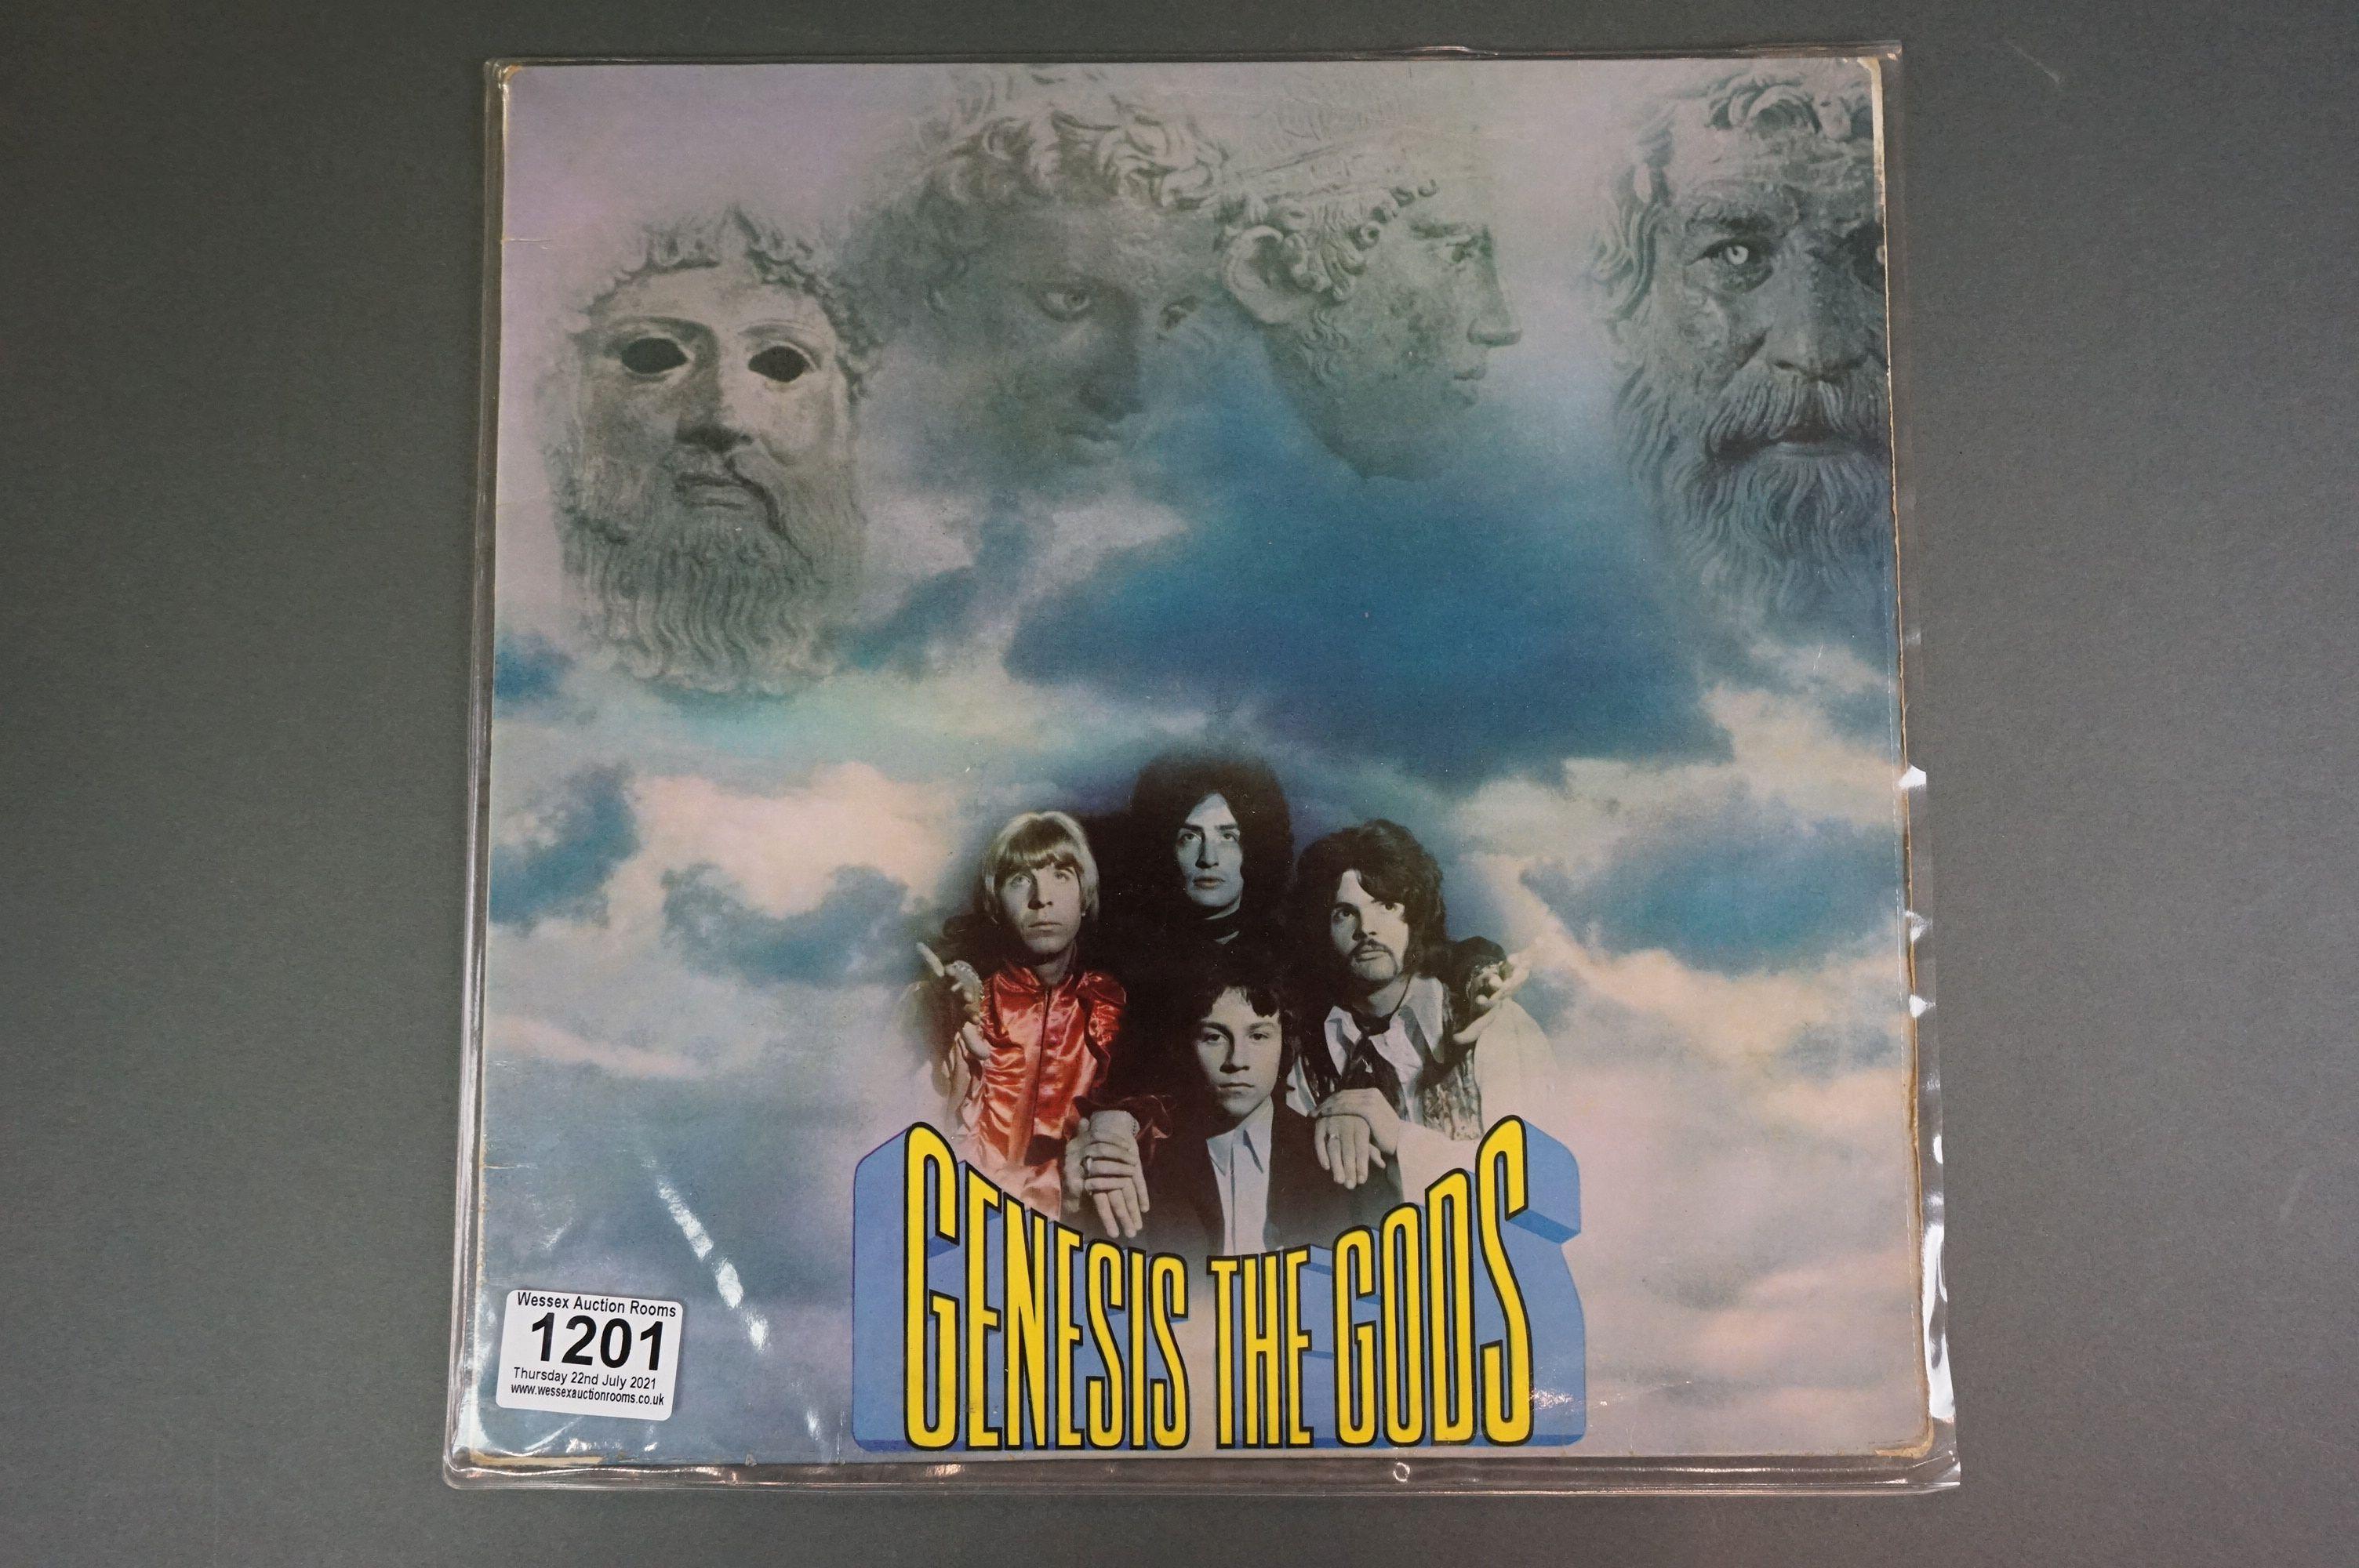 Vinyl - The Gods - Genesis LP SCX6286 sold in UK to label, sleeve and vinyl vg+